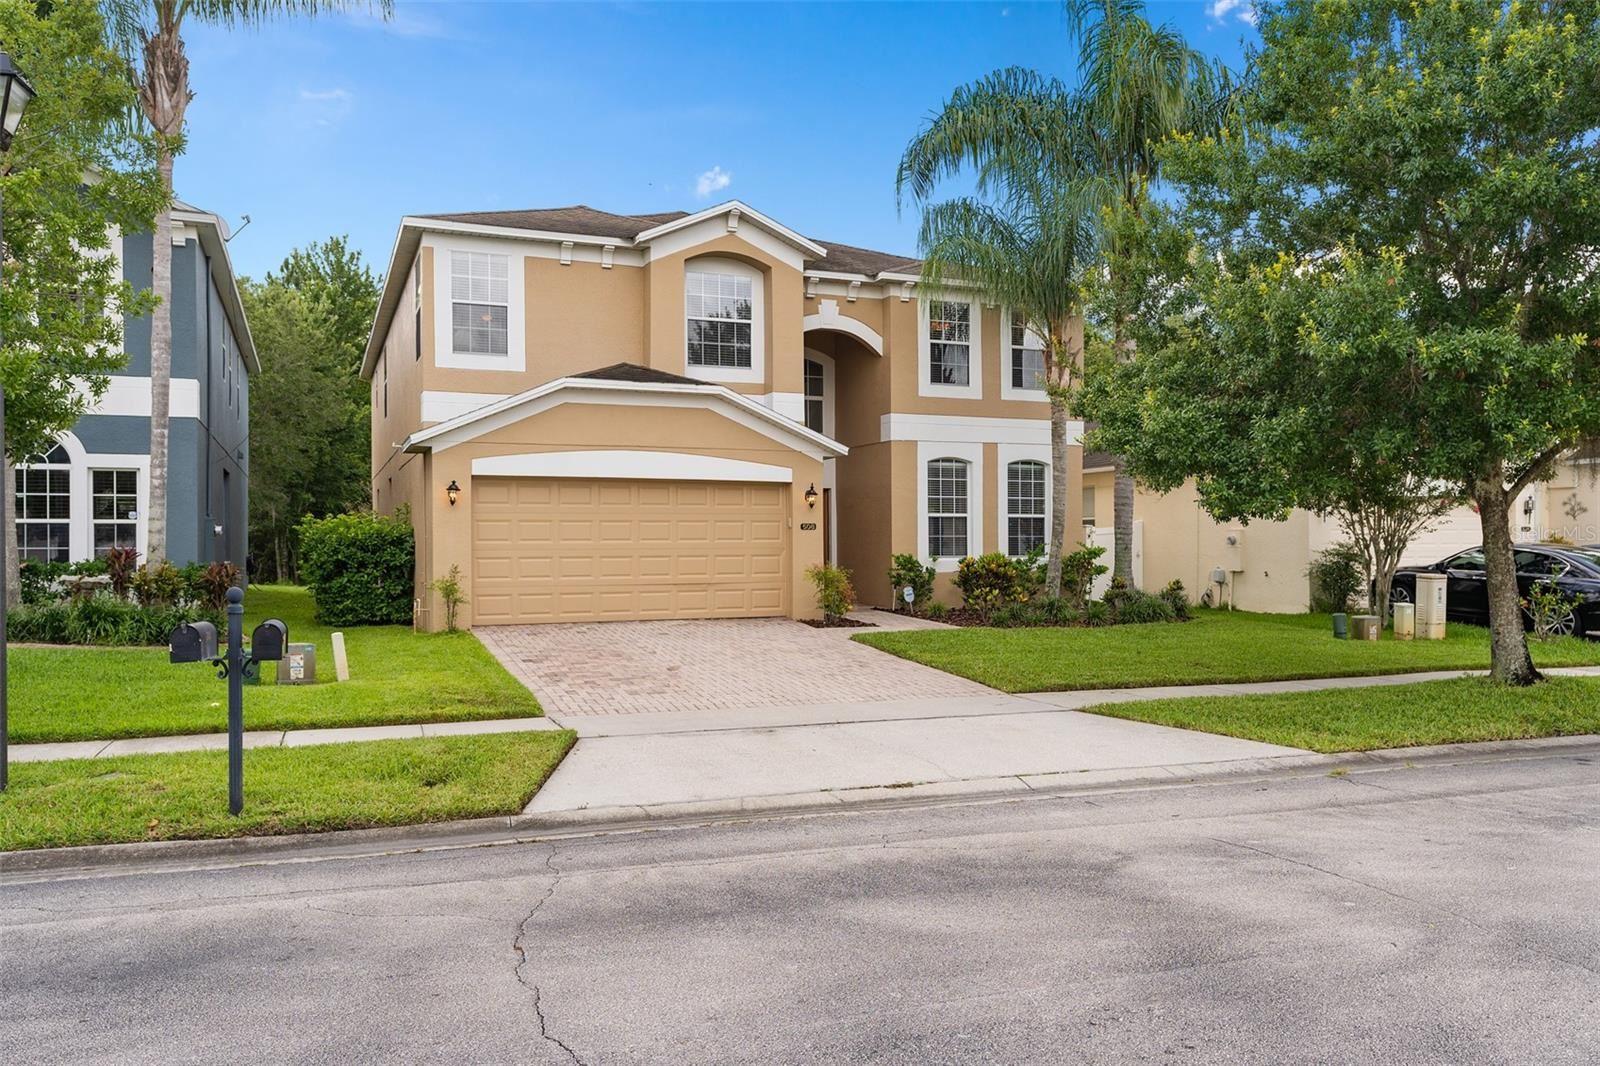 508 BELLA VIDA BOULEVARD, Orlando, FL 32828 - #: O5955973